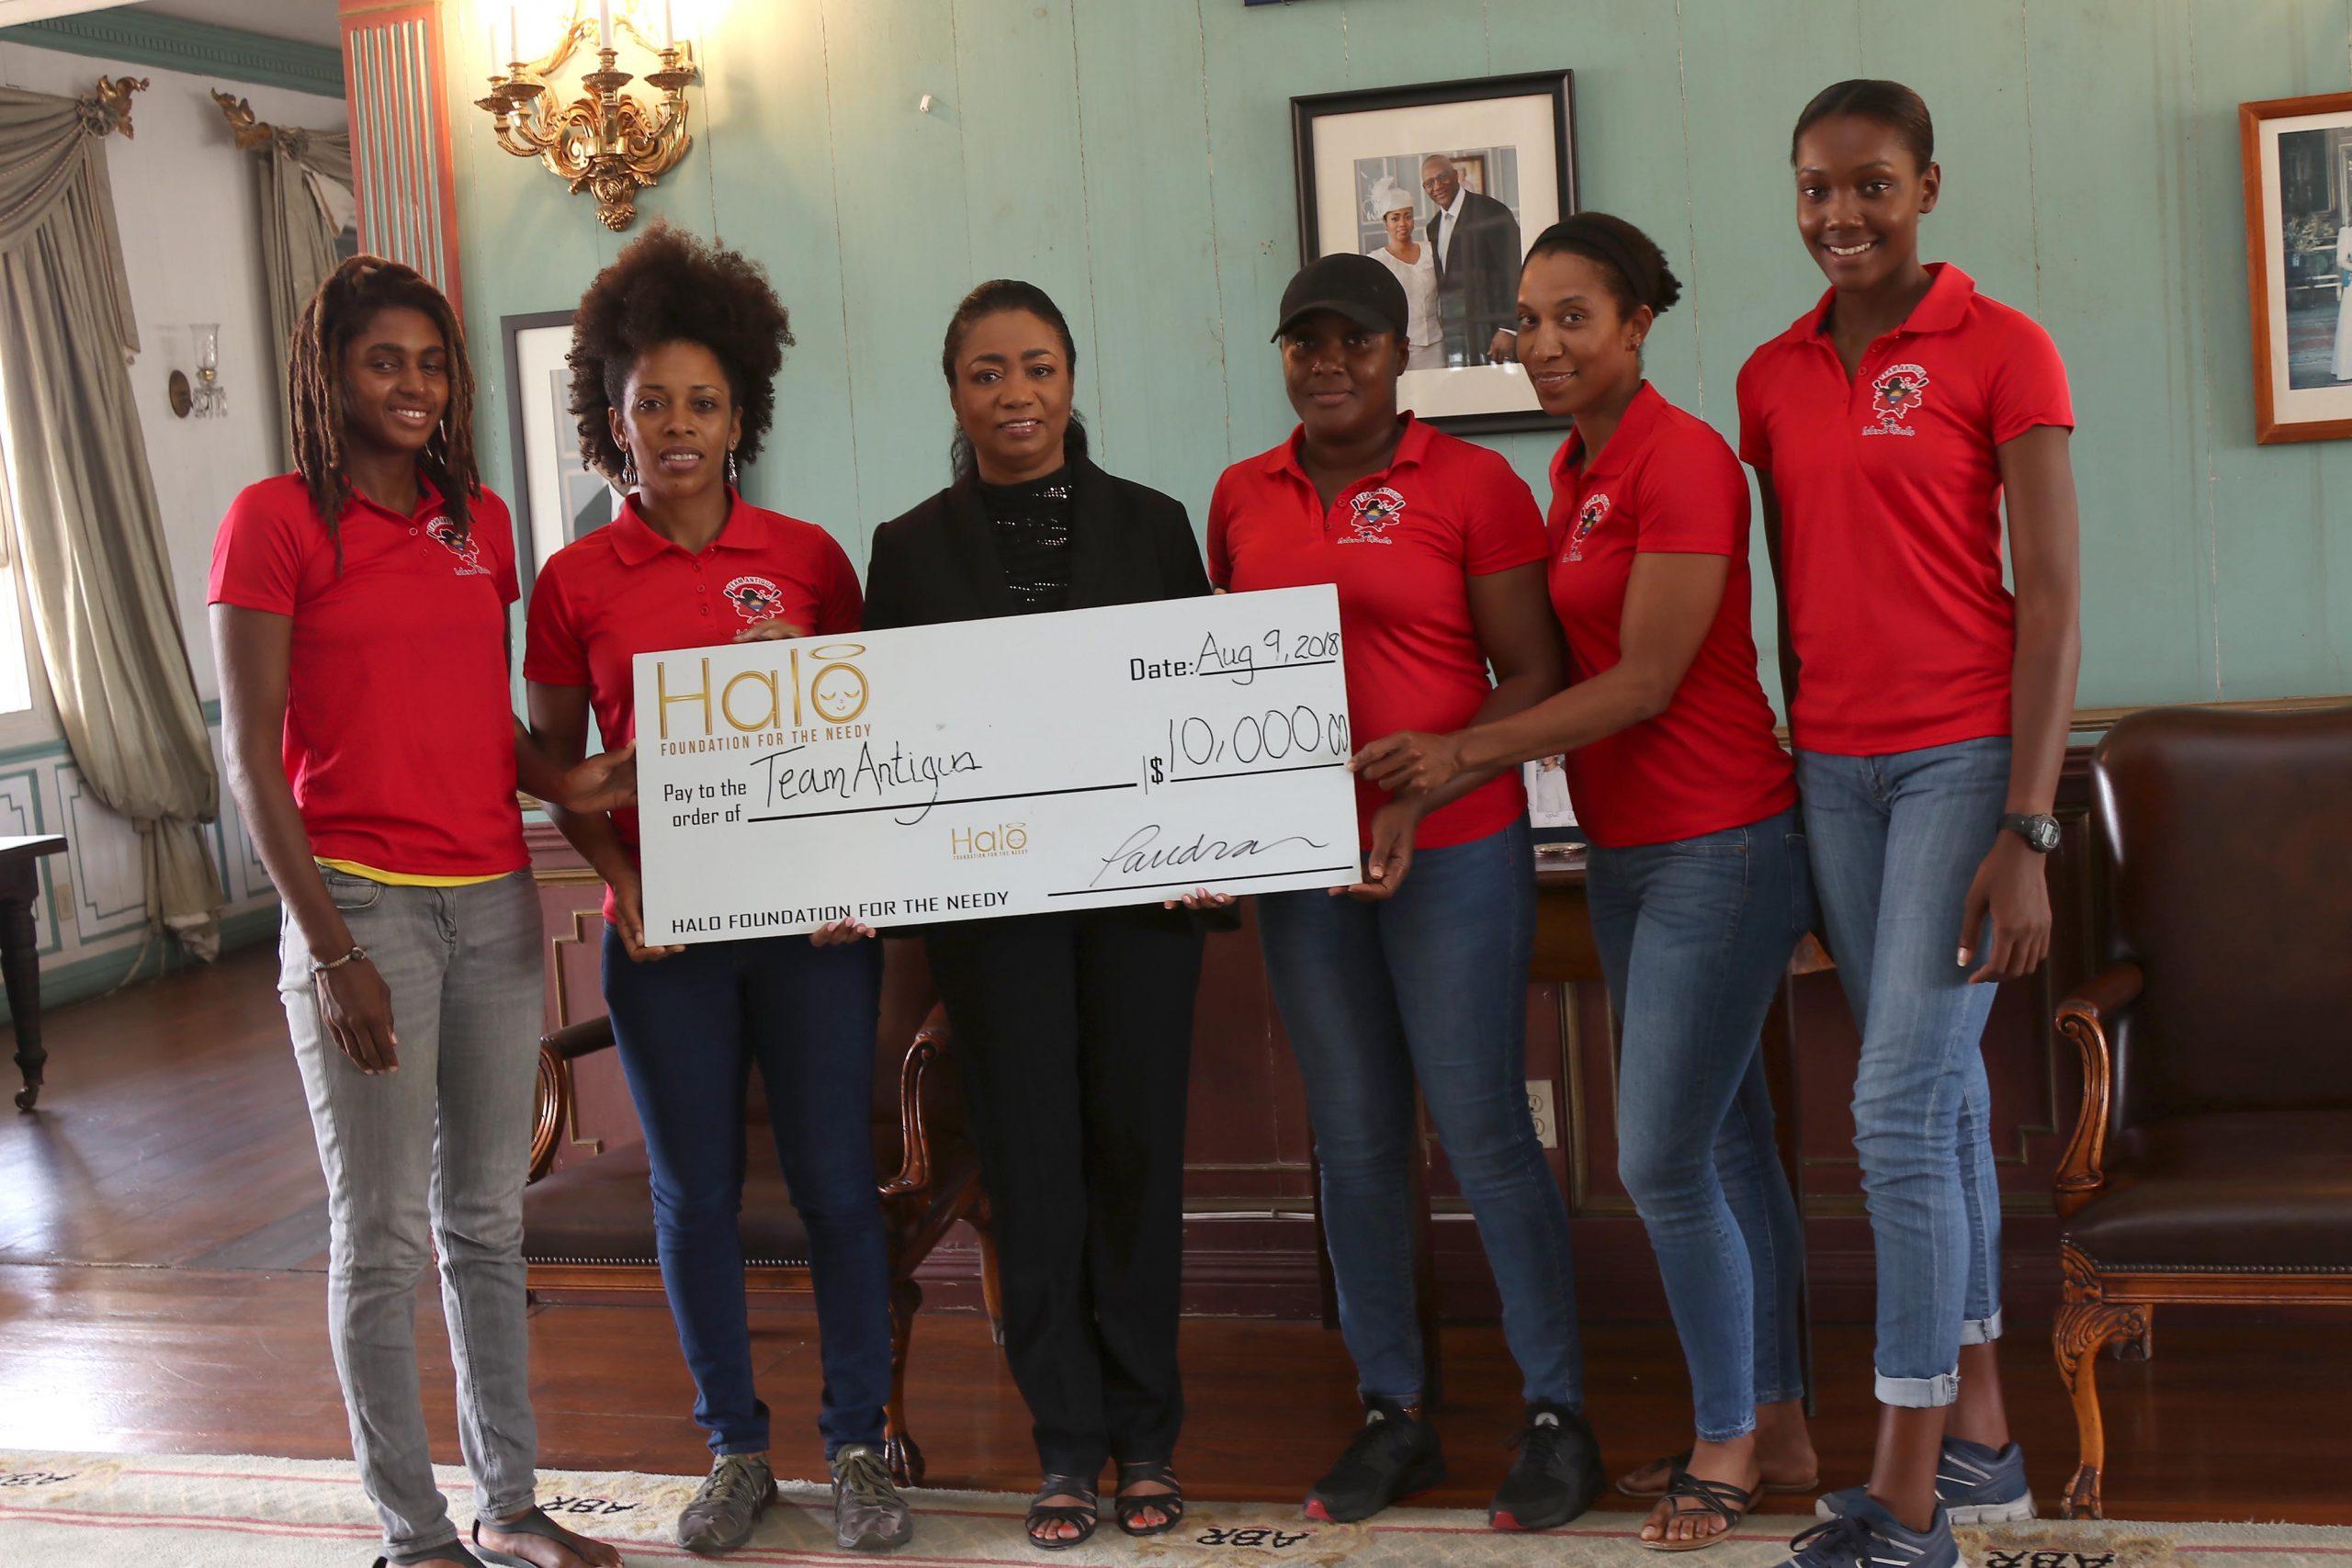 Halo Foundation Donates $10K to Team Antigua Island Girls